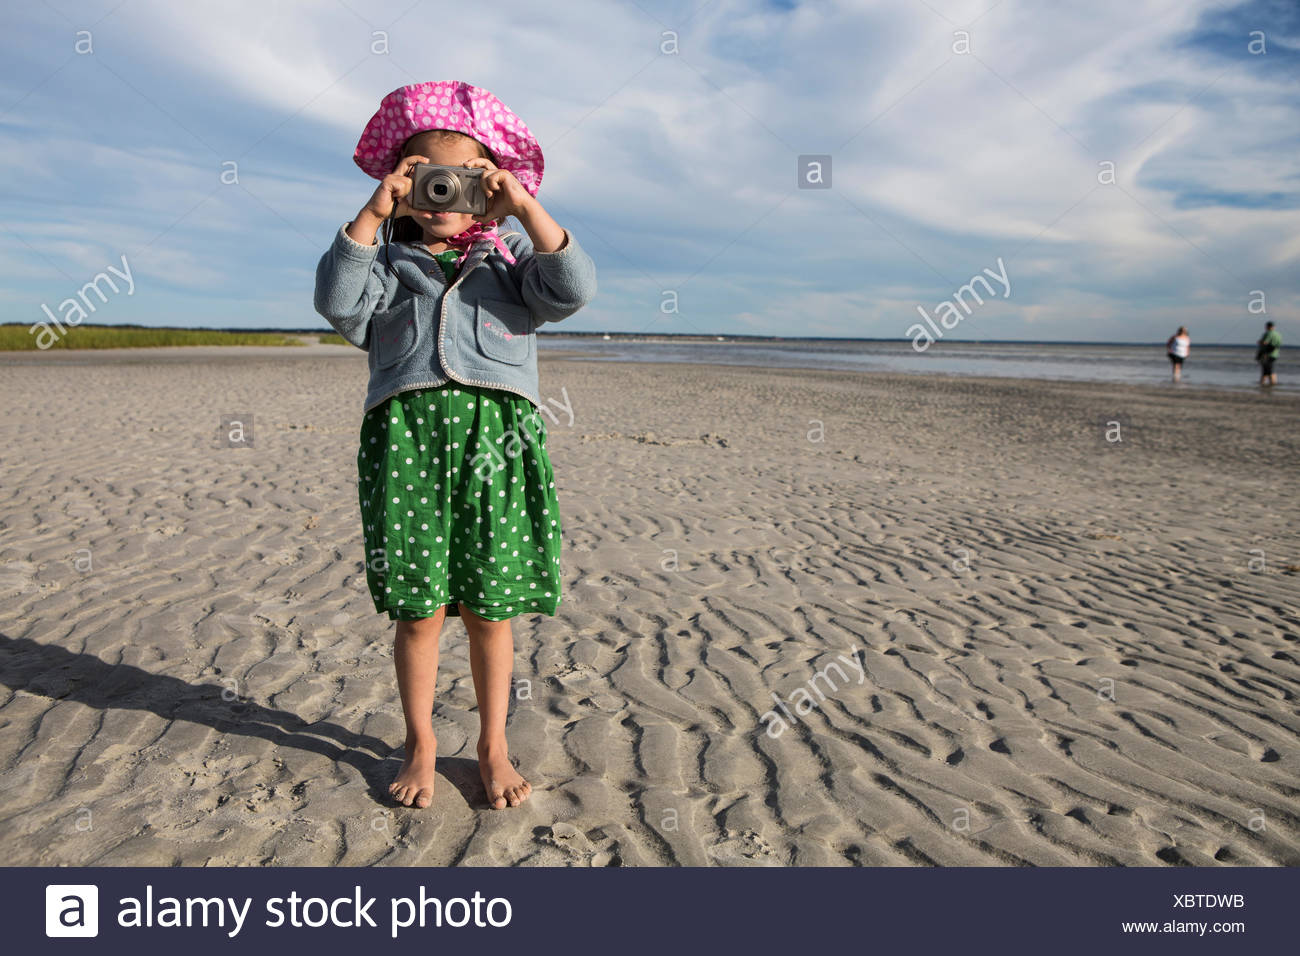 Ein junges Mädchen fotografiert am Skaket Strand. Stockbild